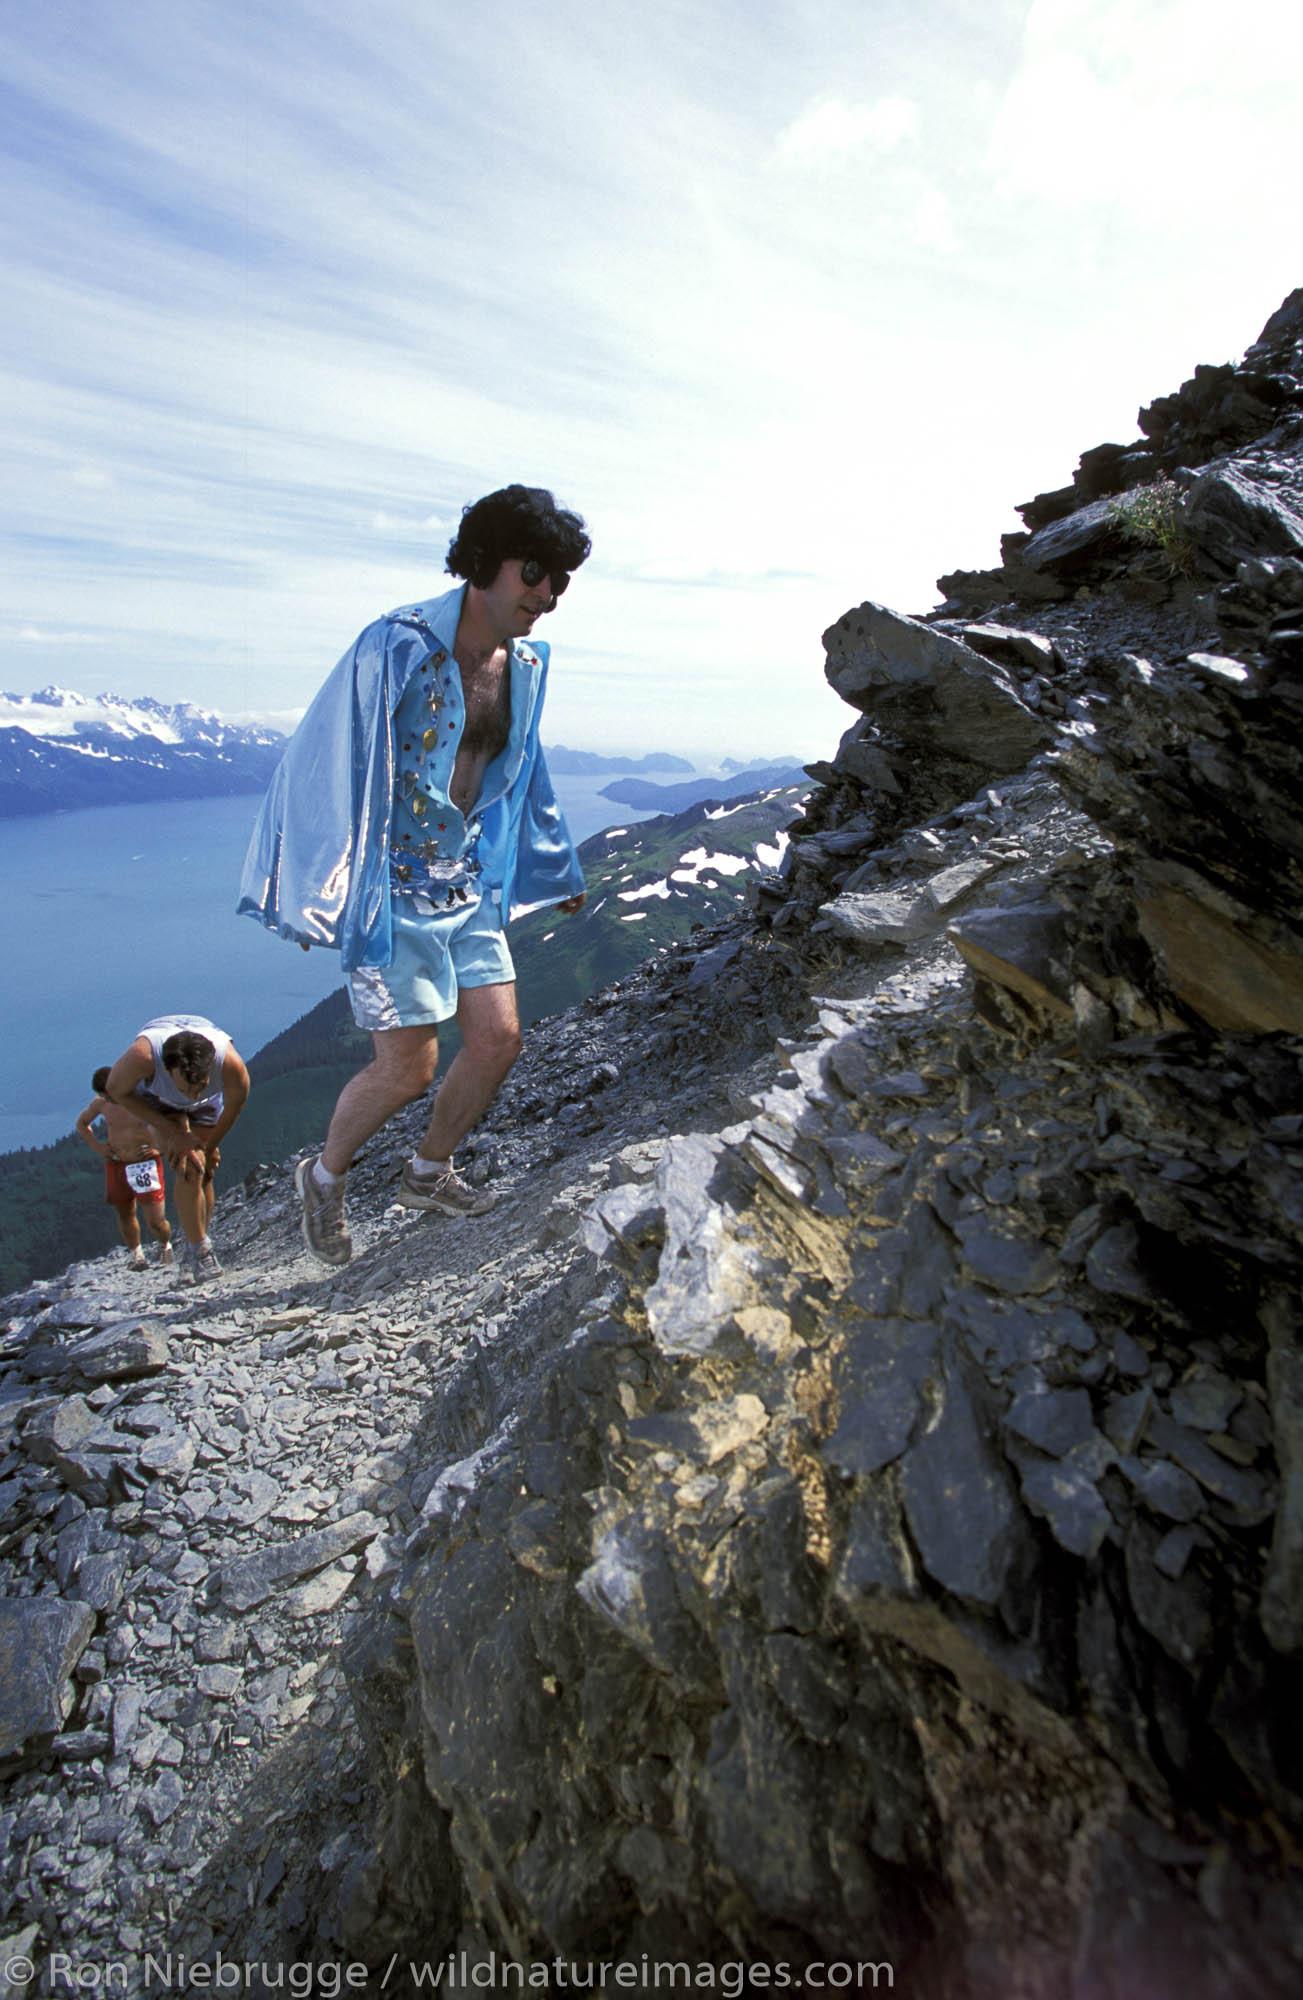 Seward annual 4th of July Mt. Marathon Race in 2002.  Seward,  Alaska.